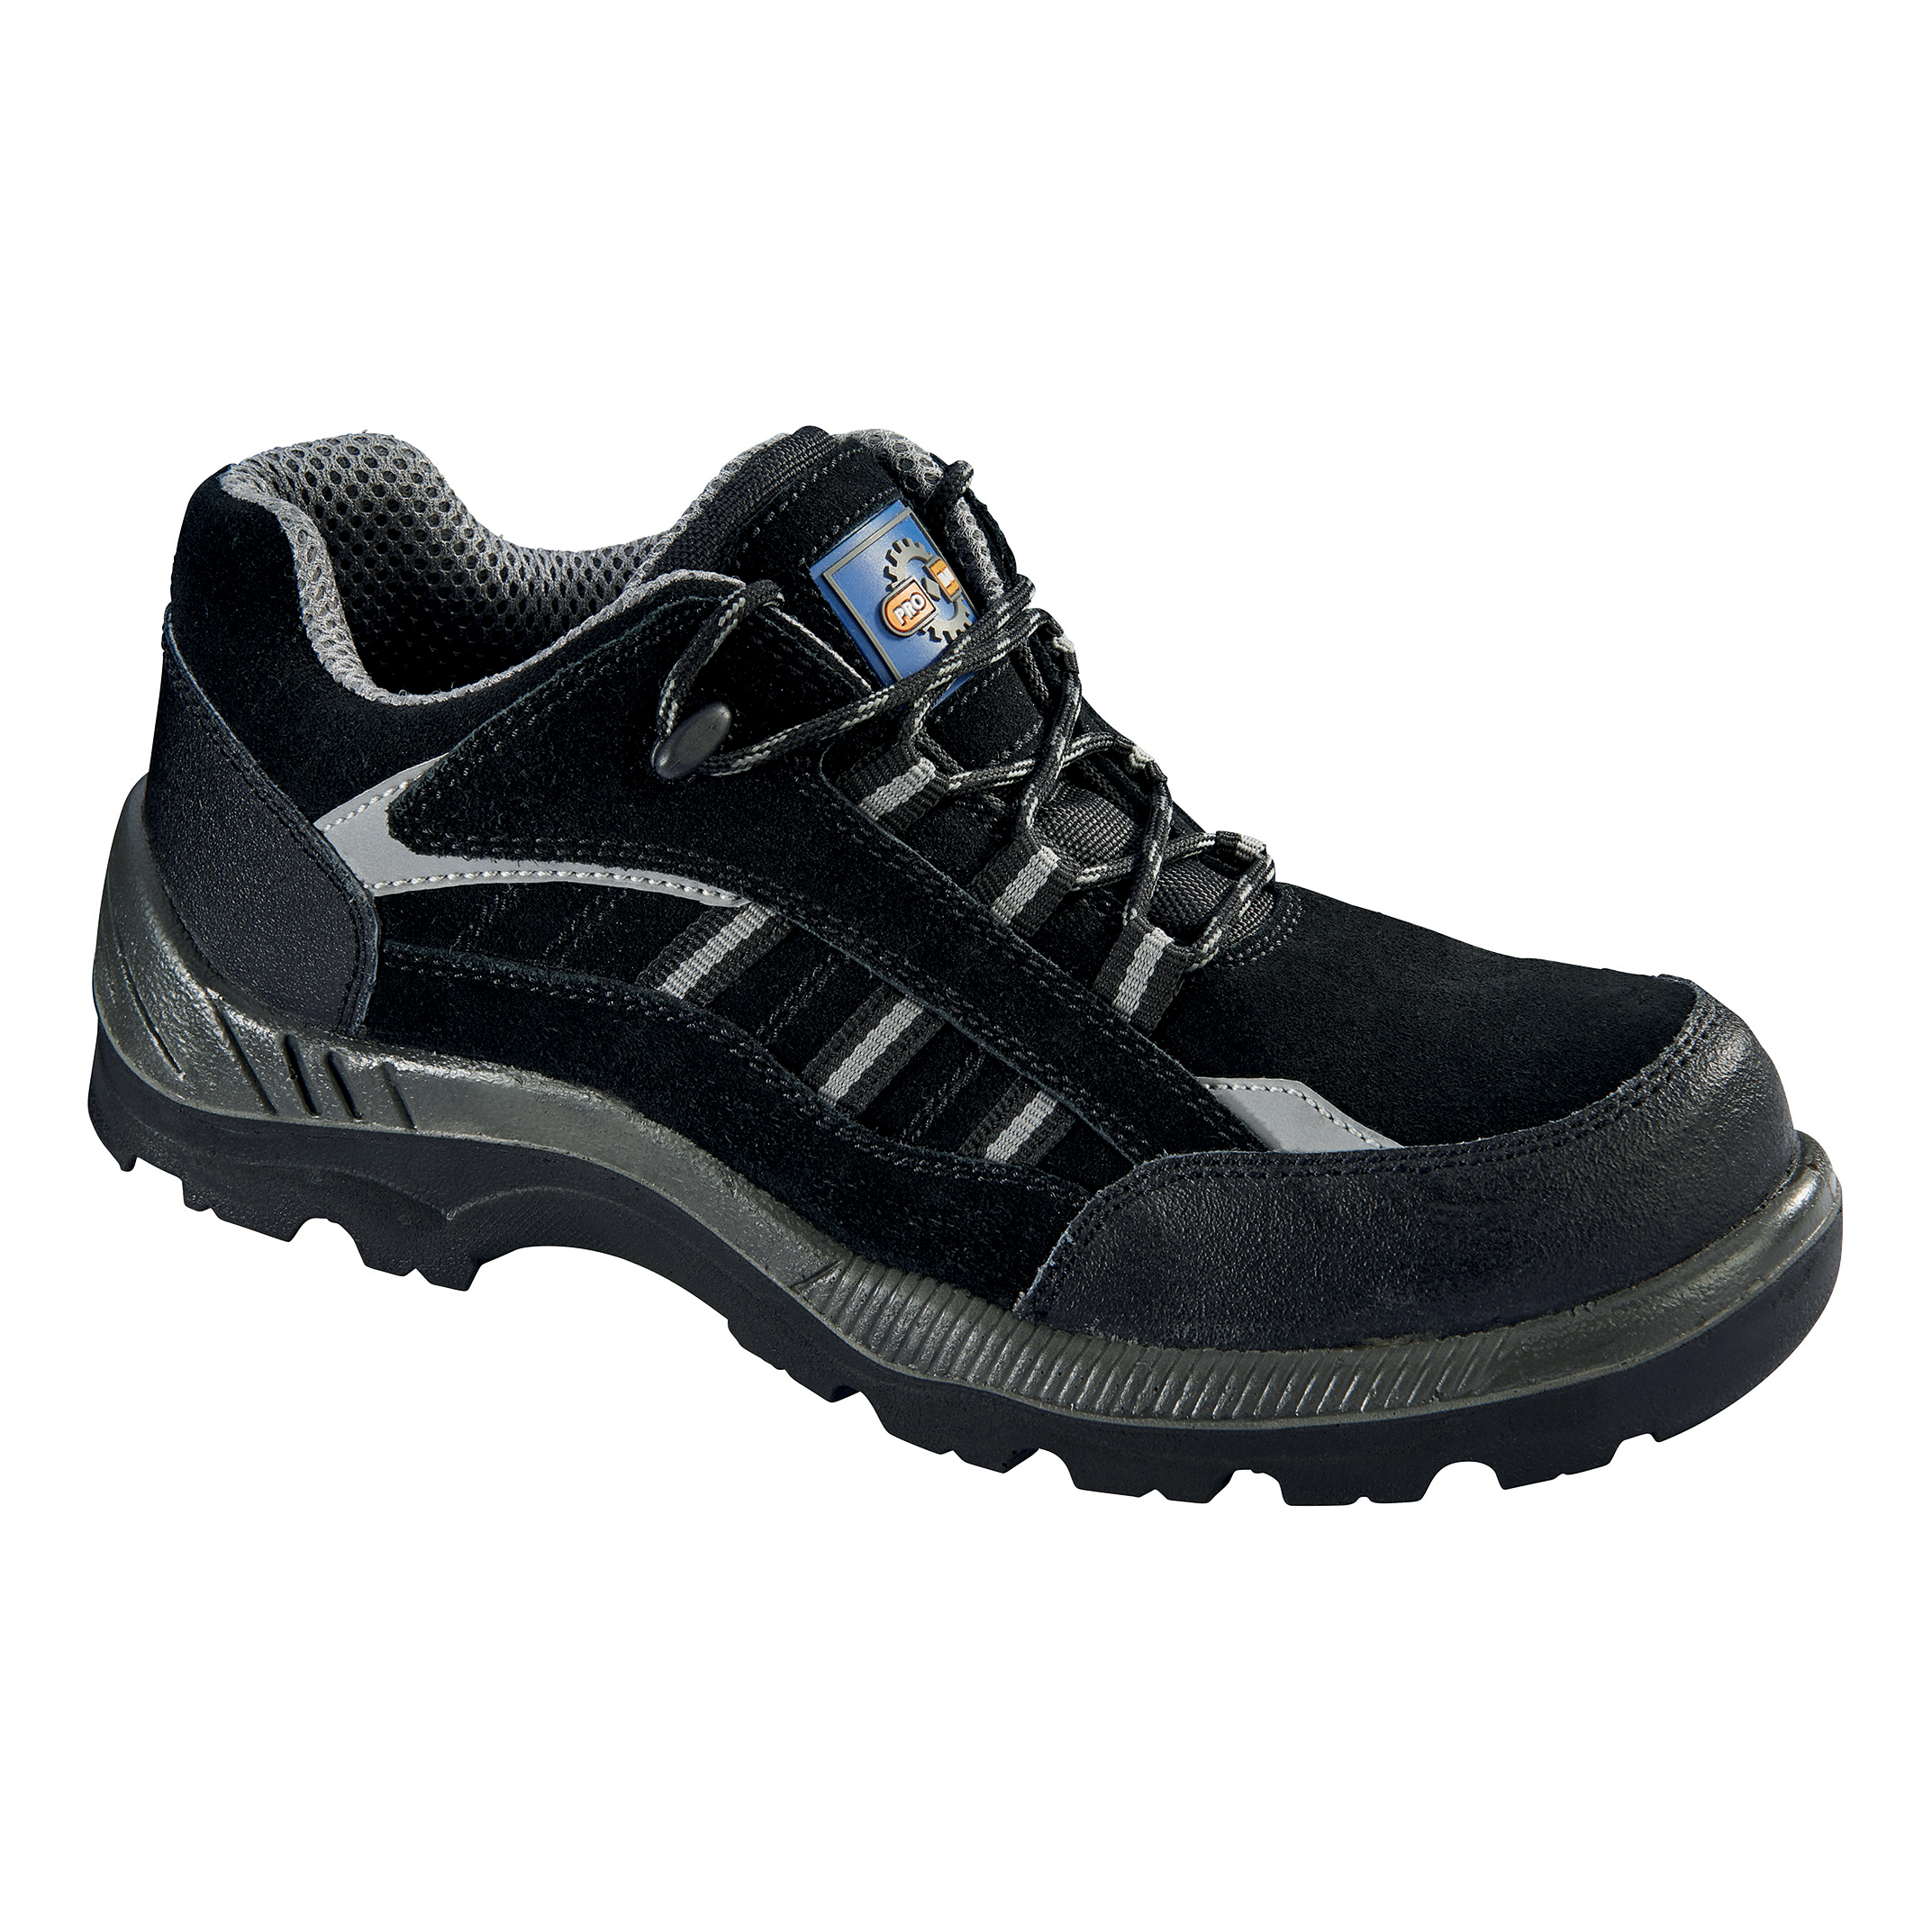 Rockfall ProMan Trainer Suede Fibreglass Toecap Black Size 3 Ref PM4040 3